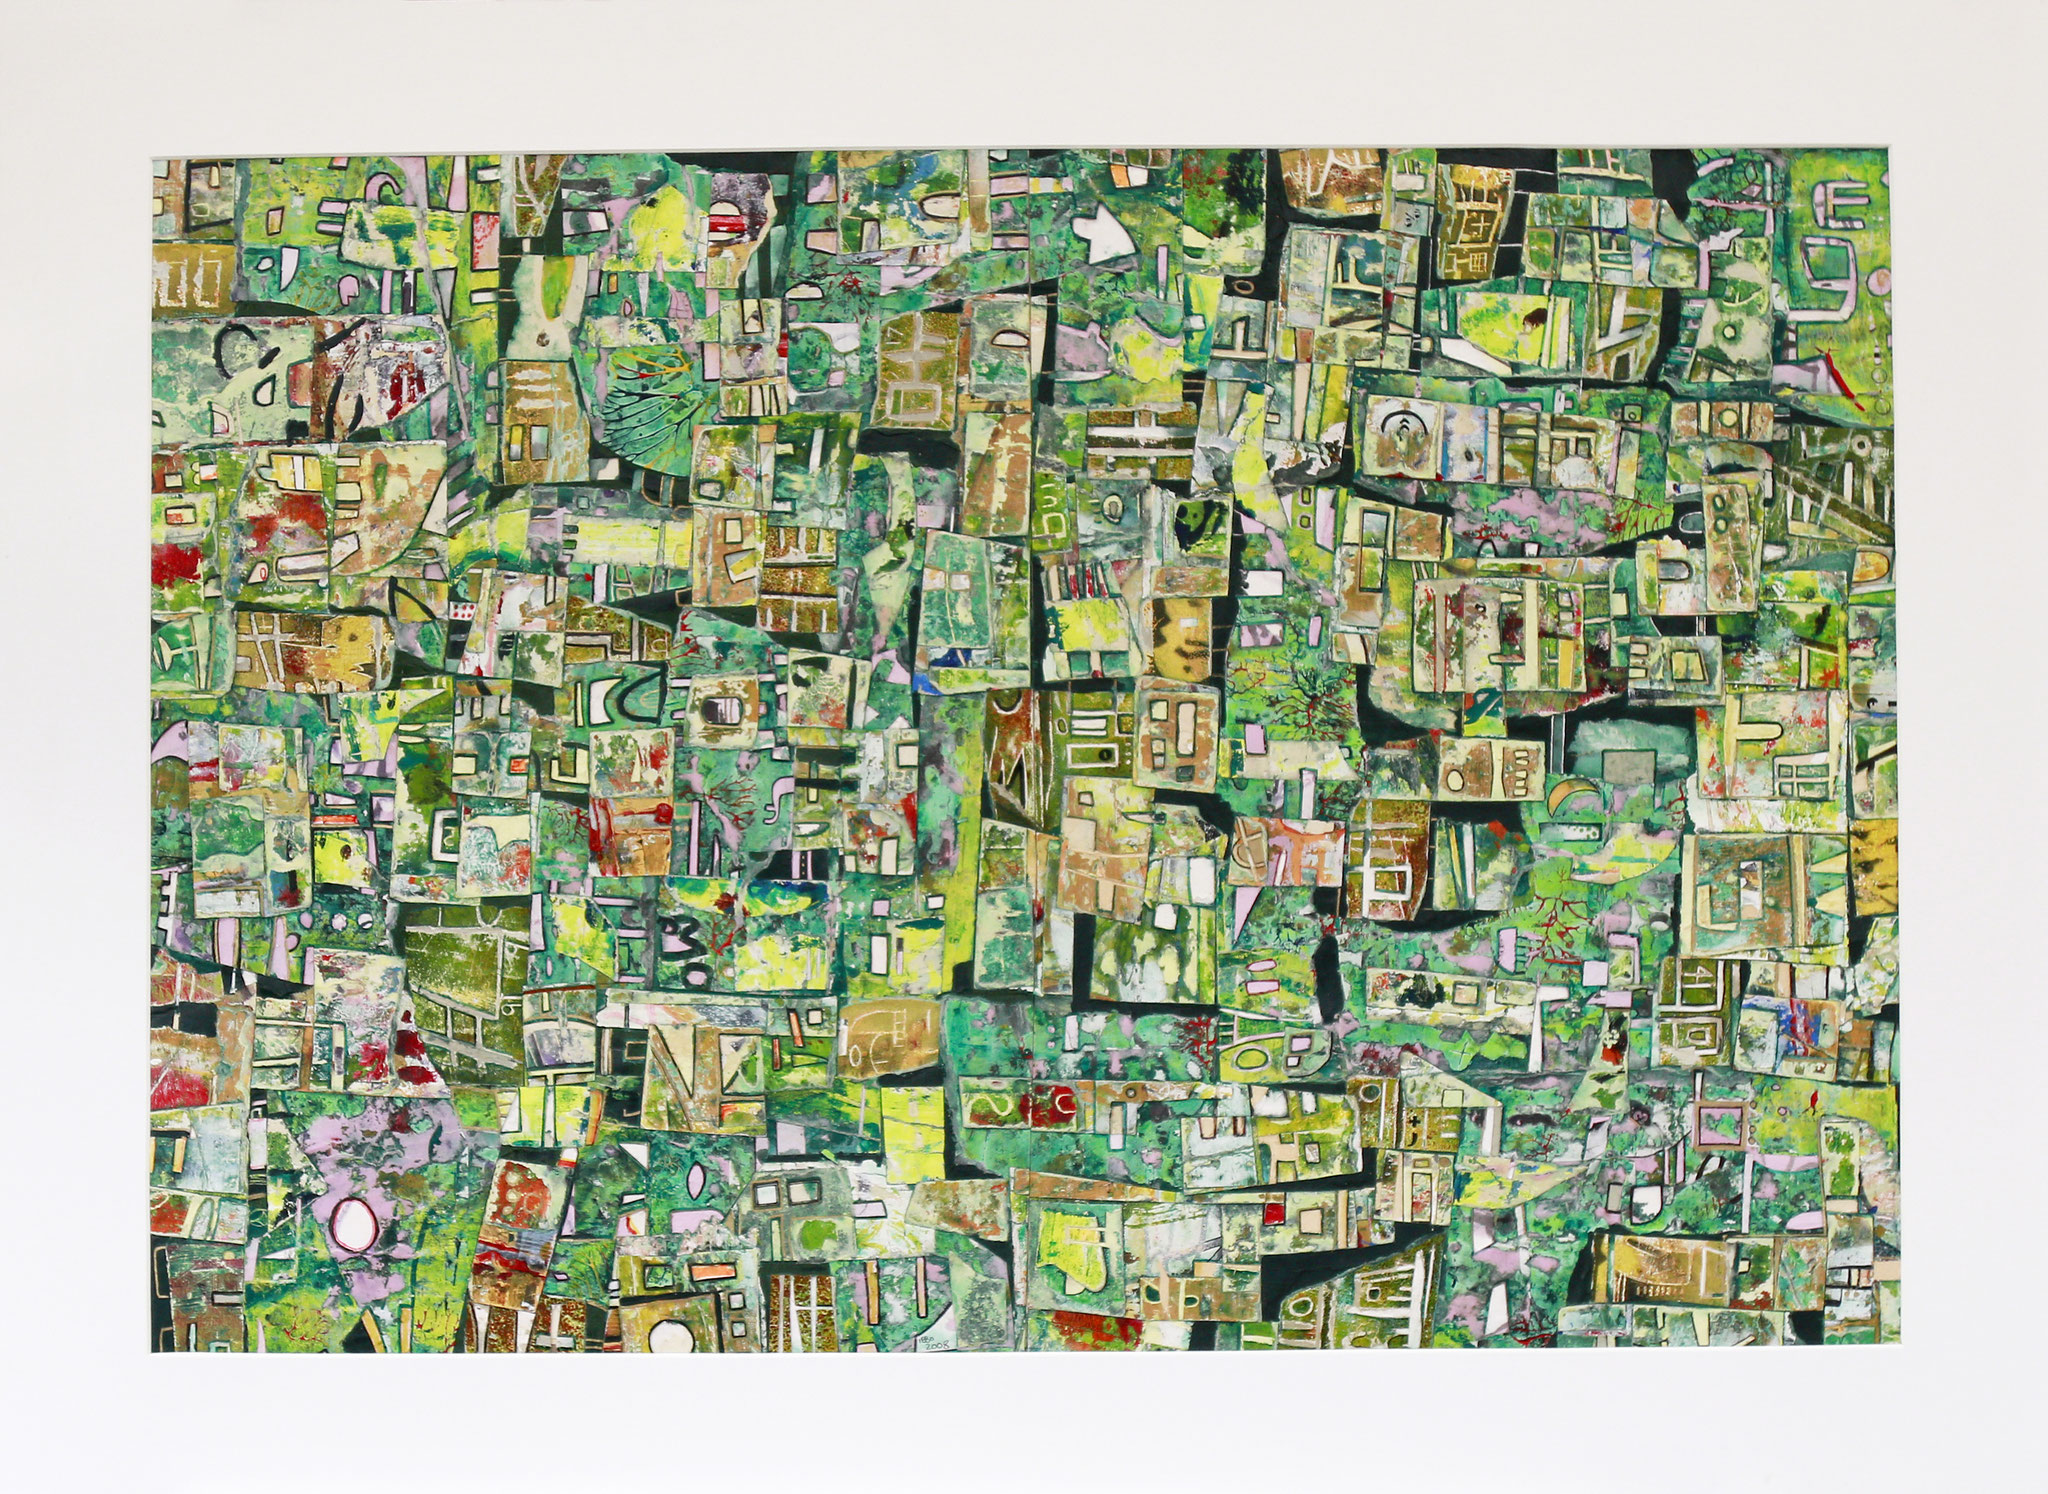 Green Favela 2017 Mixed media 82 x 56 cm (97 x 72 cm mounted)